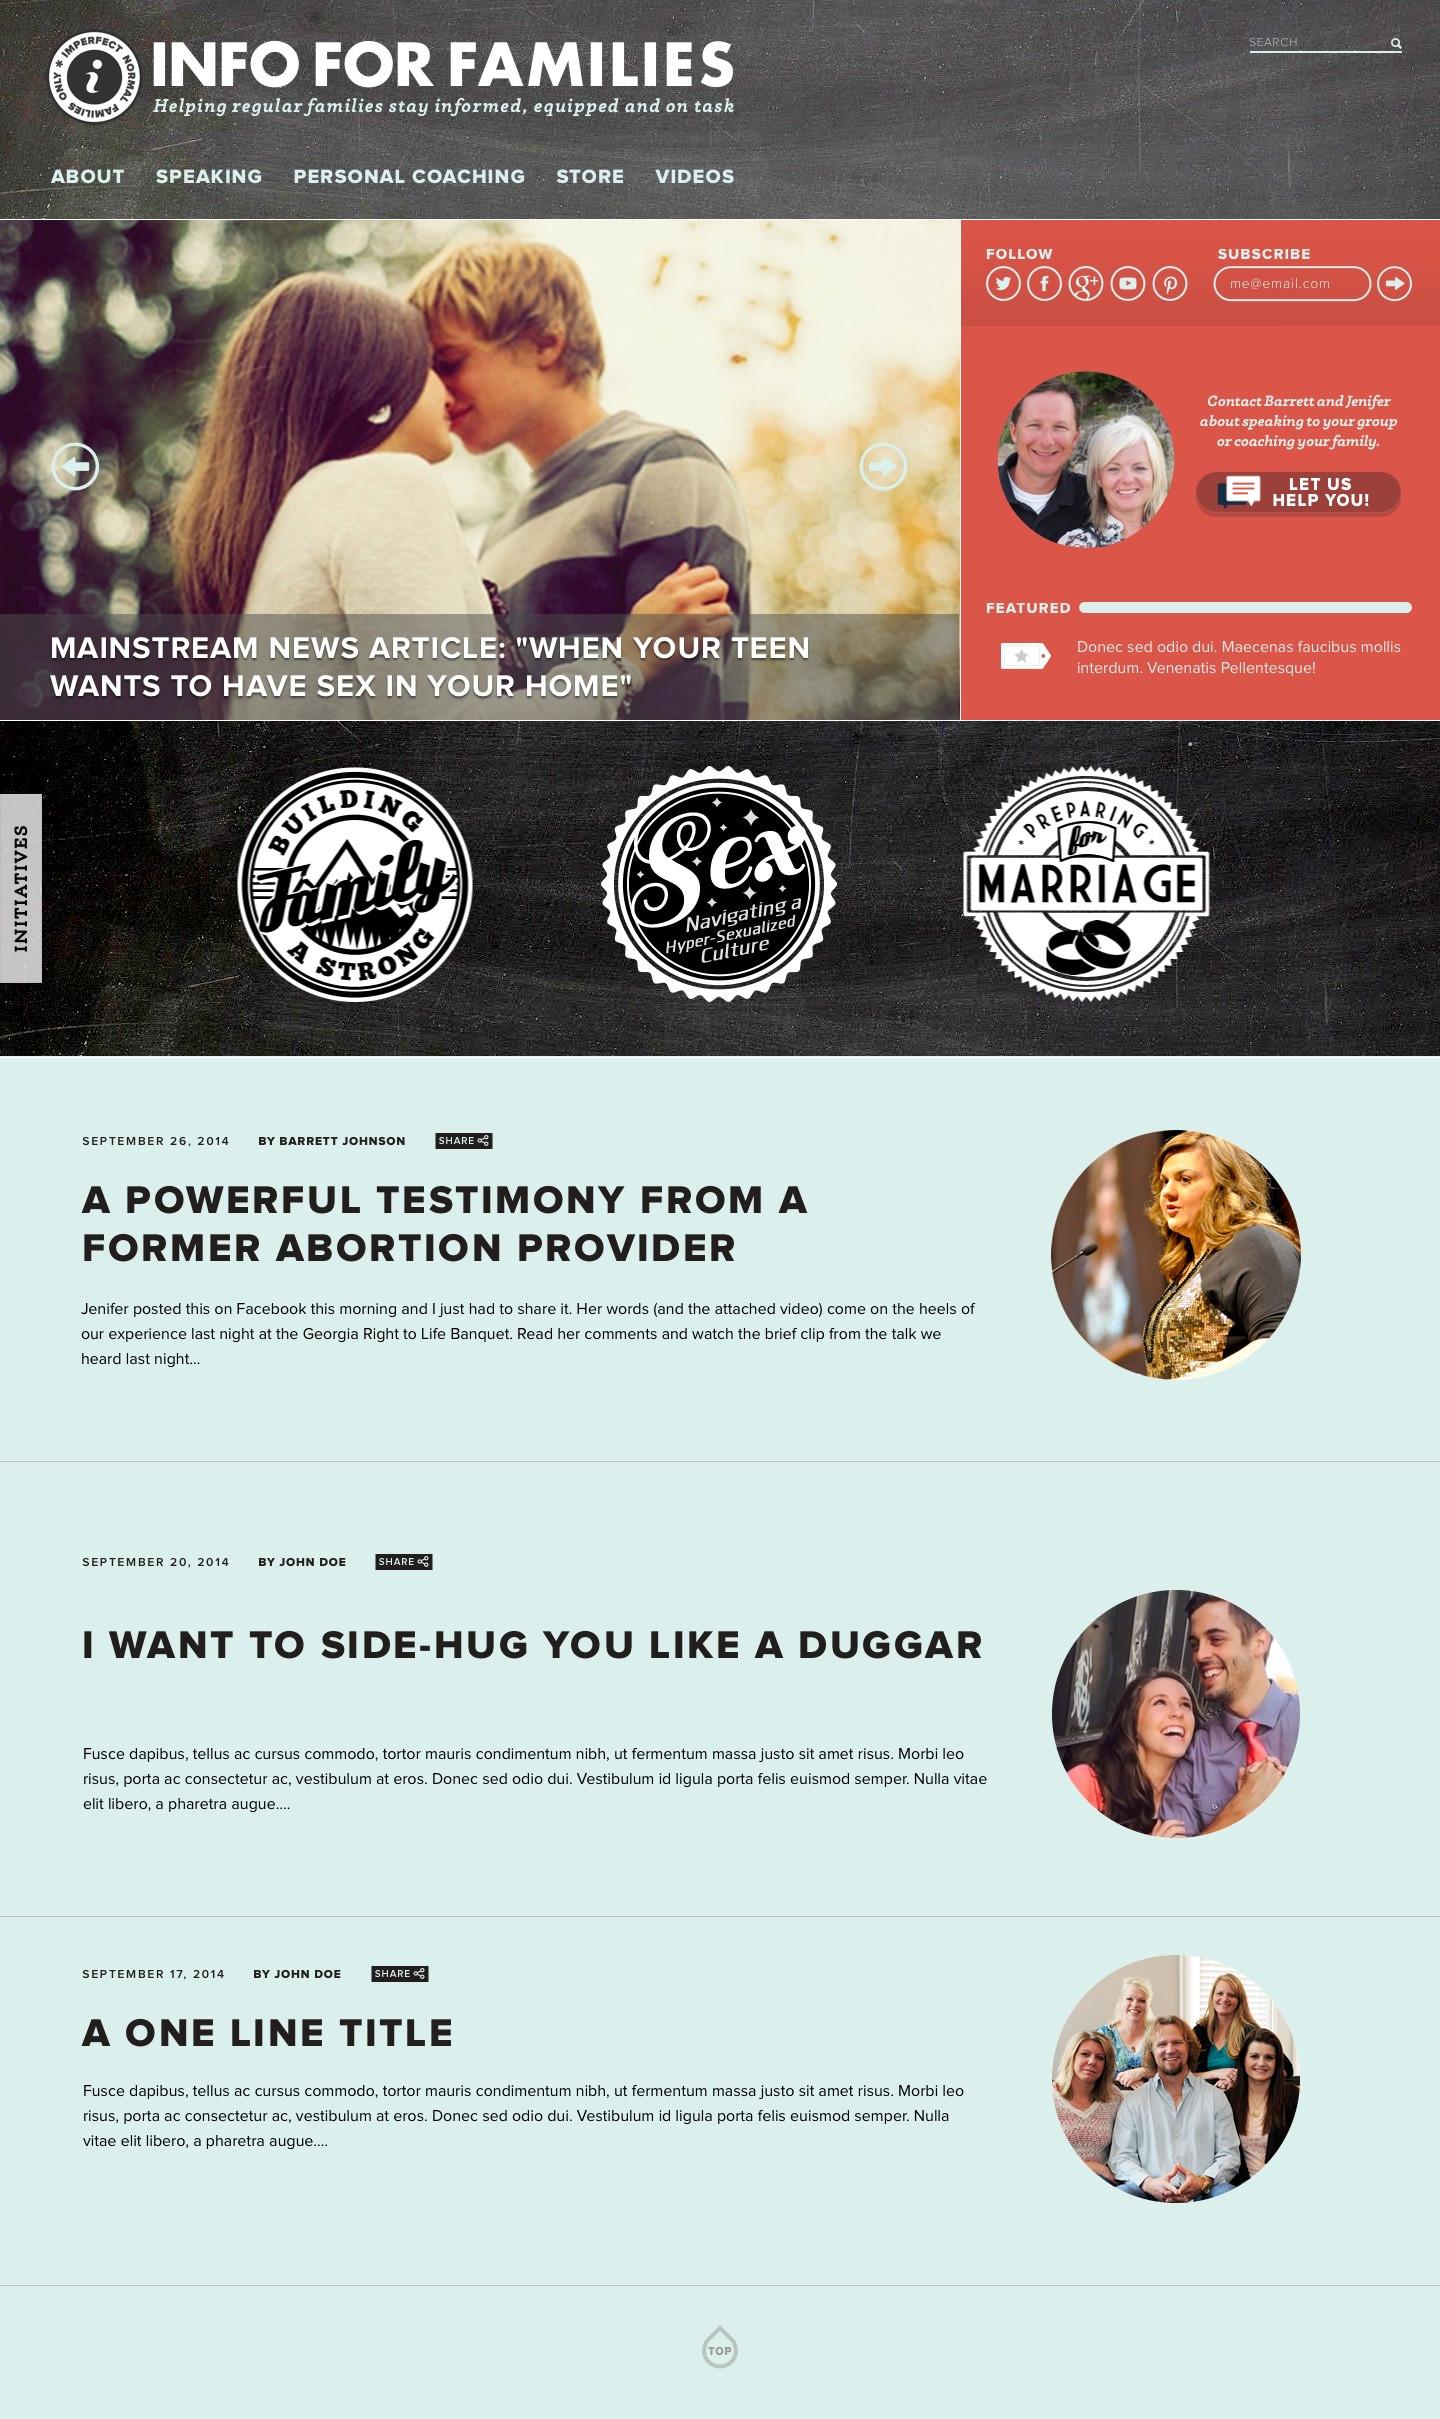 INFO-Final-Homepage.jpg